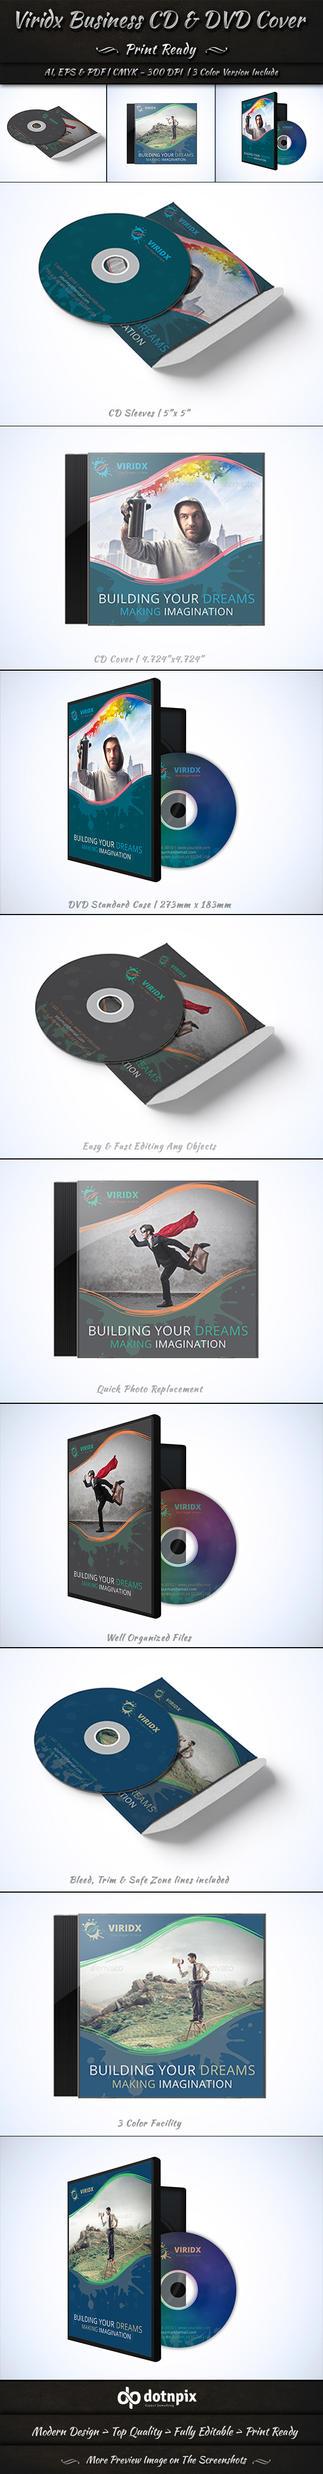 Viridx Business CD & DVD Cover by dotnpix